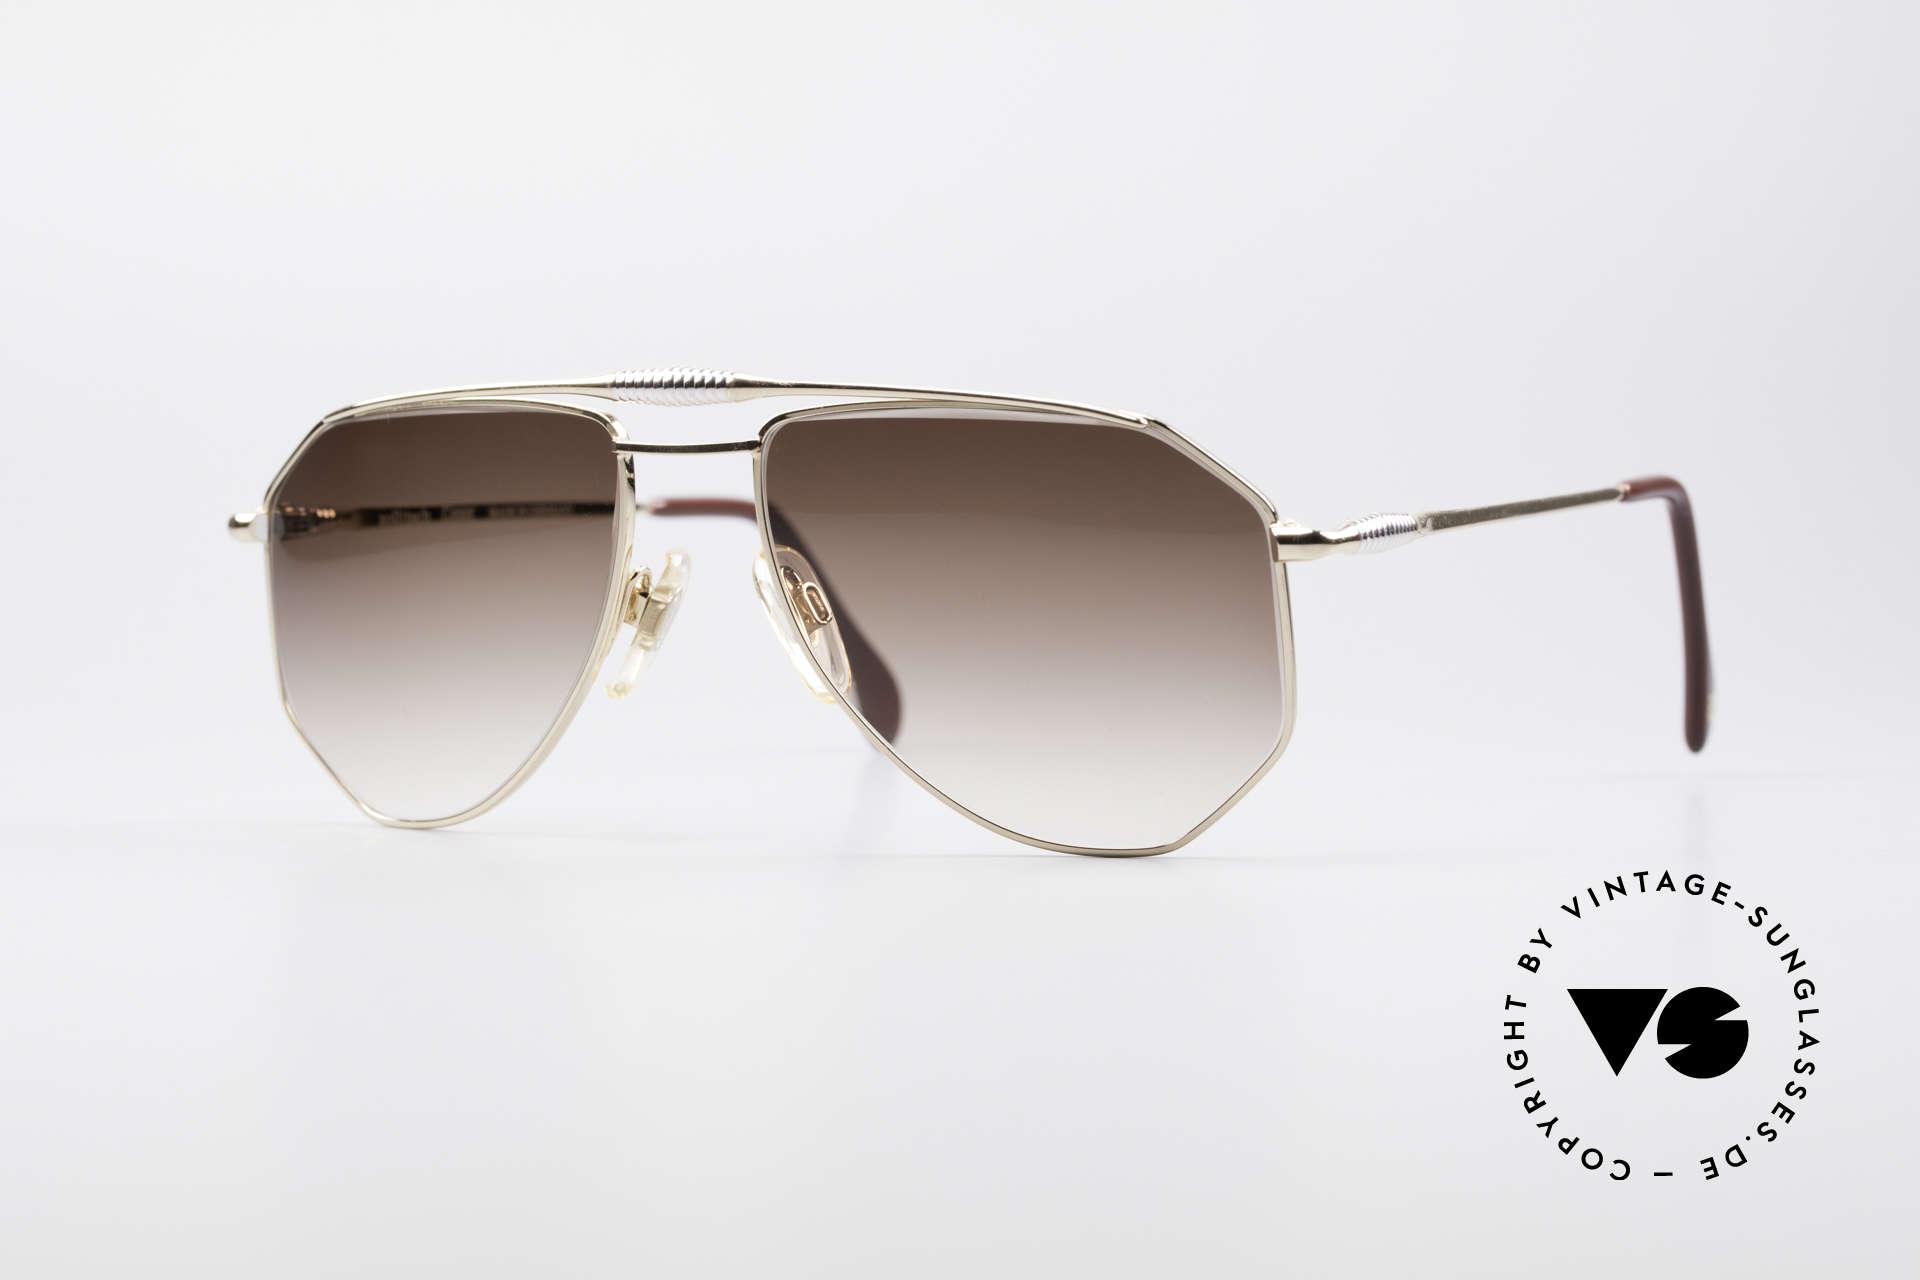 Zollitsch Cadre 120 Medium 80's Vintage Shades, vintage Zollitsch designer sunglasses from the late 80's, Made for Men